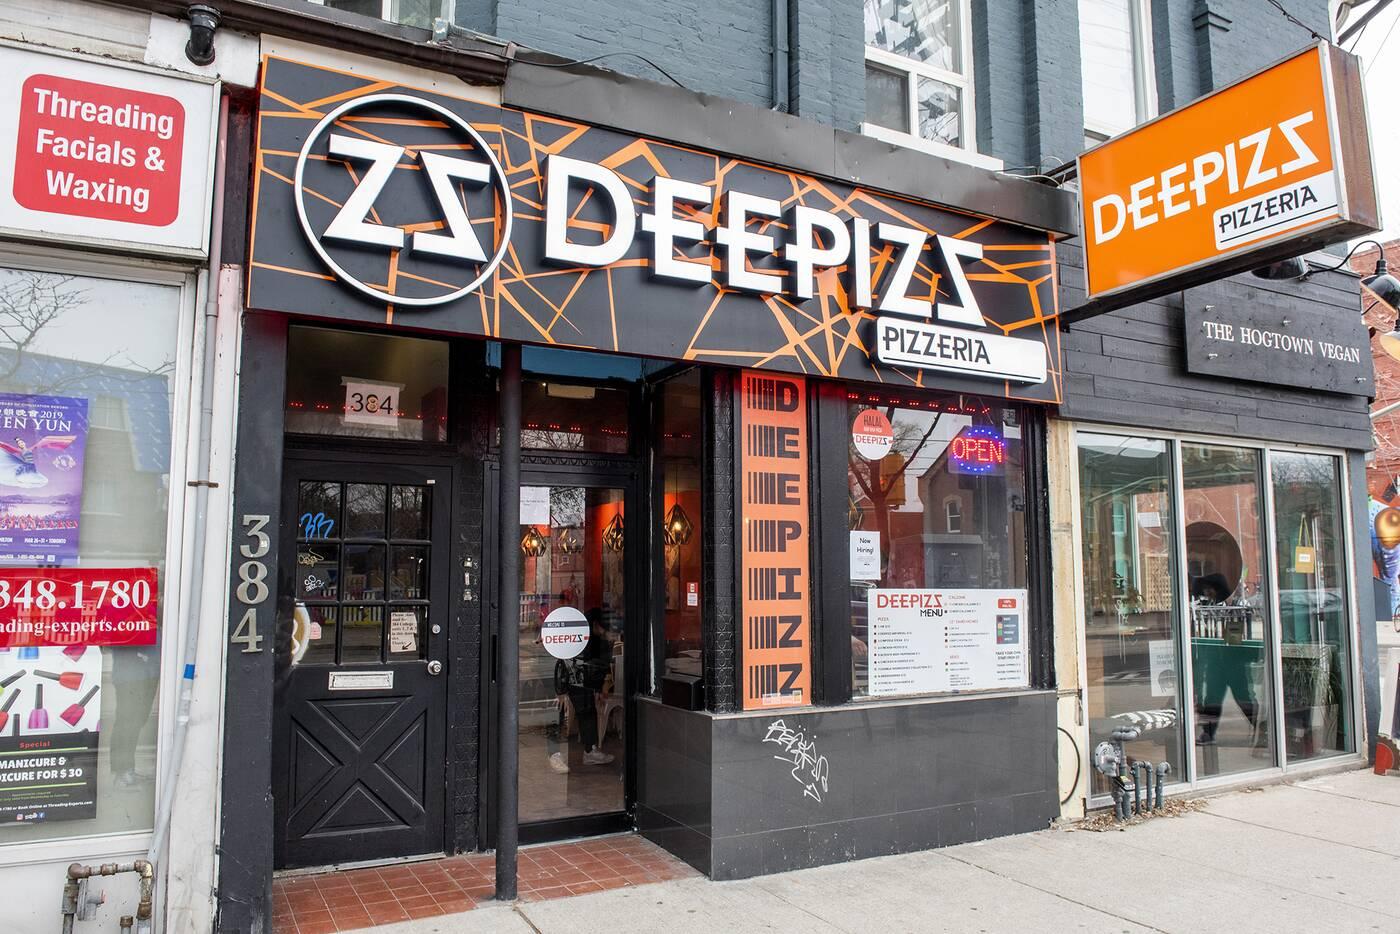 DeePizz Toronto